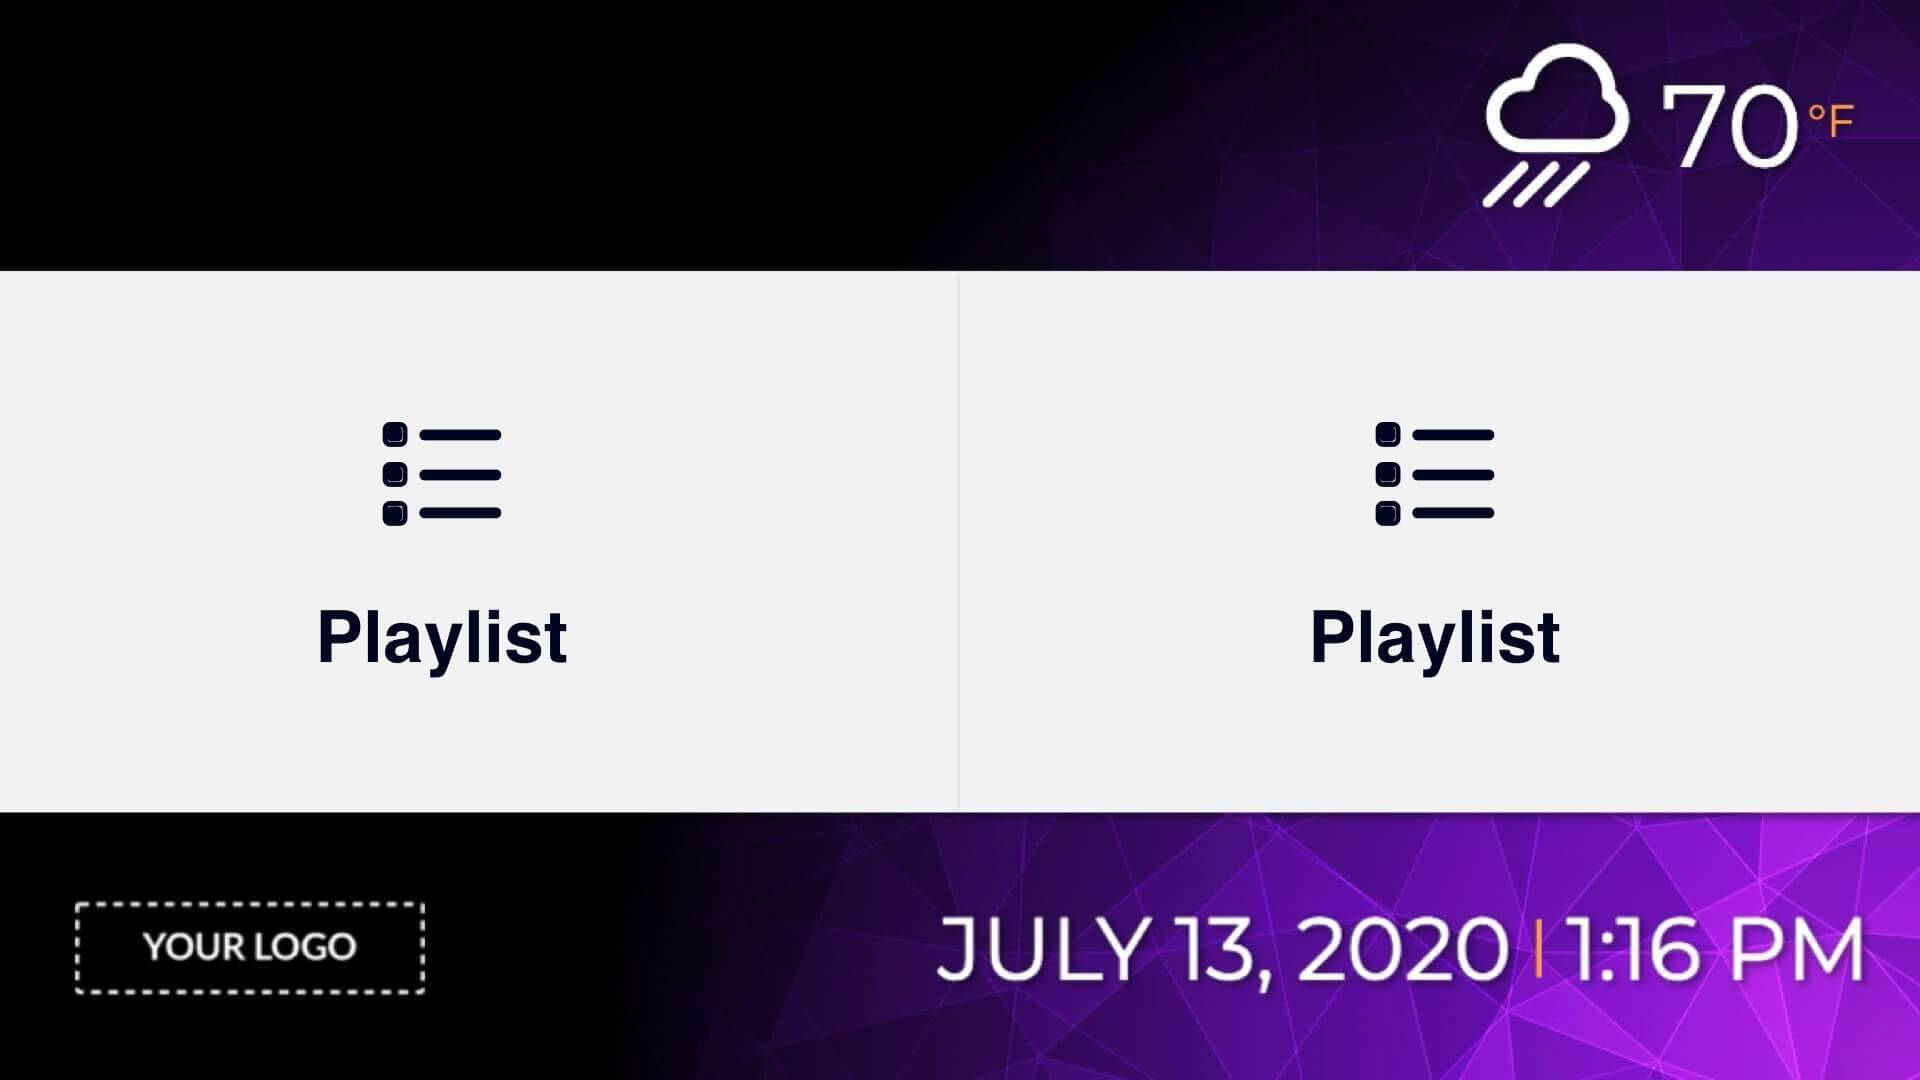 Zoned Playlist 2x1 Presentation Digital Signage Template